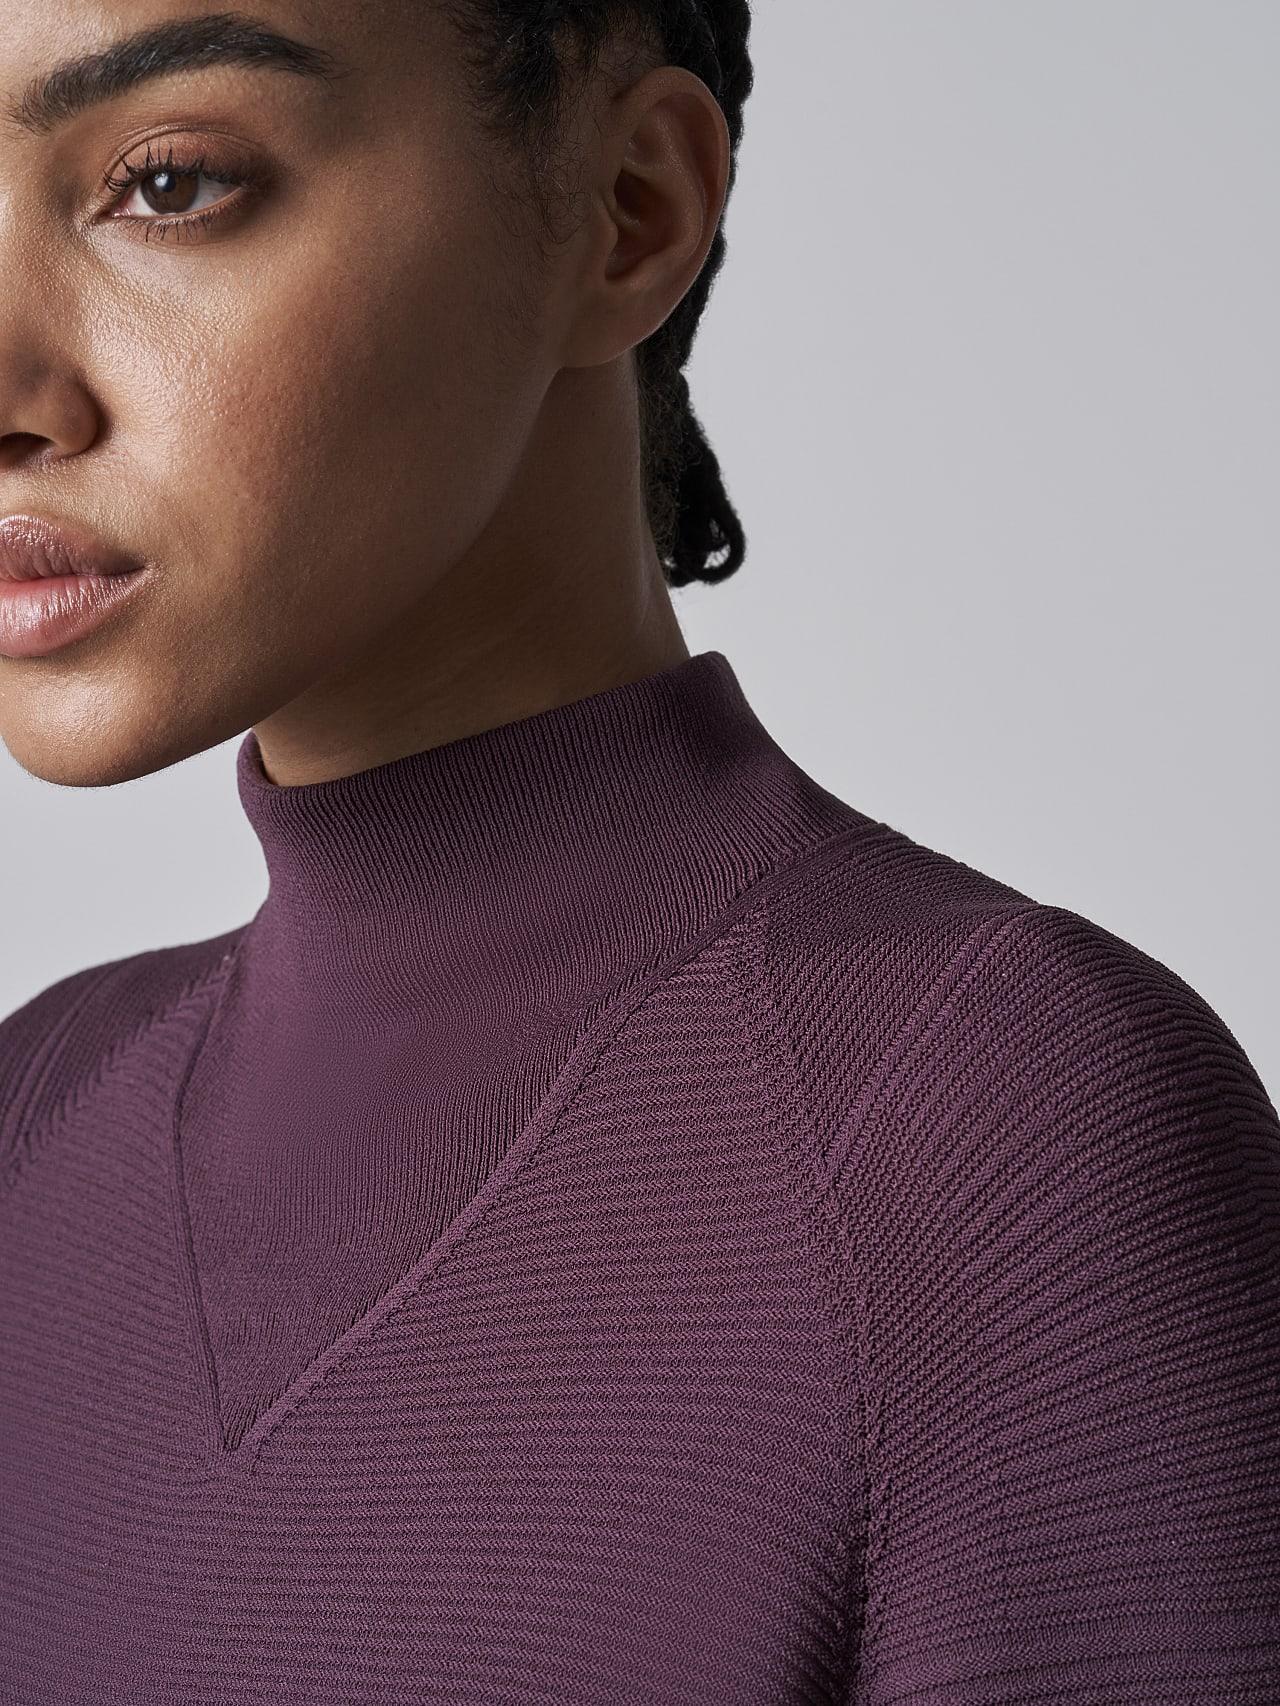 FOXEE V1.Y5.02 Seamless 3D Knit Mock-Neck Dress Burgundy Right Alpha Tauri